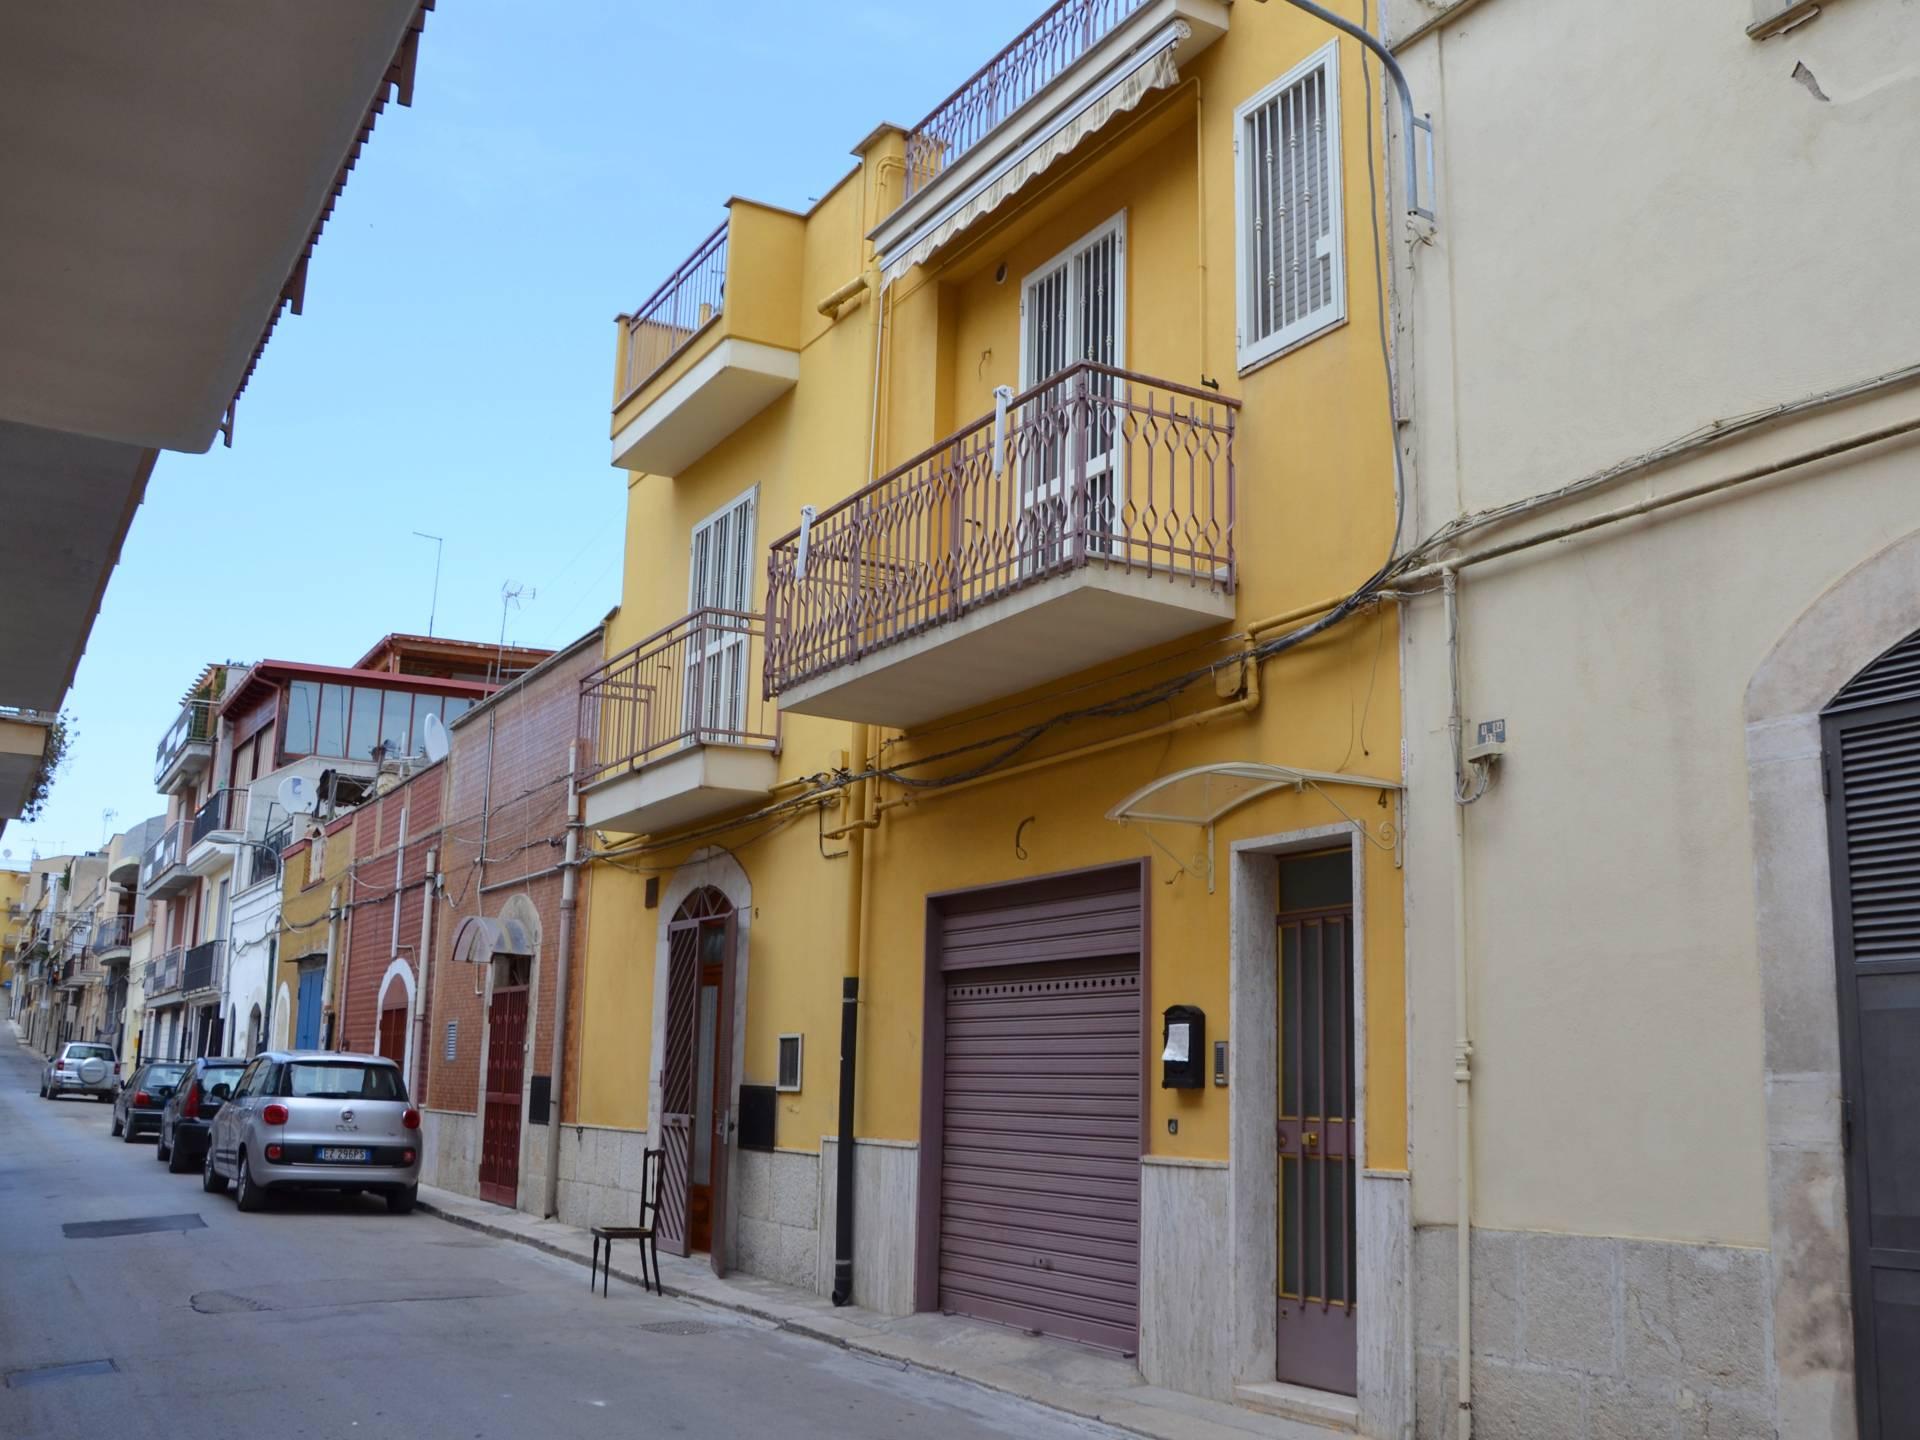 Casa singola in vendita a canosa di puglia cod r470 - Piano casa regione puglia ...